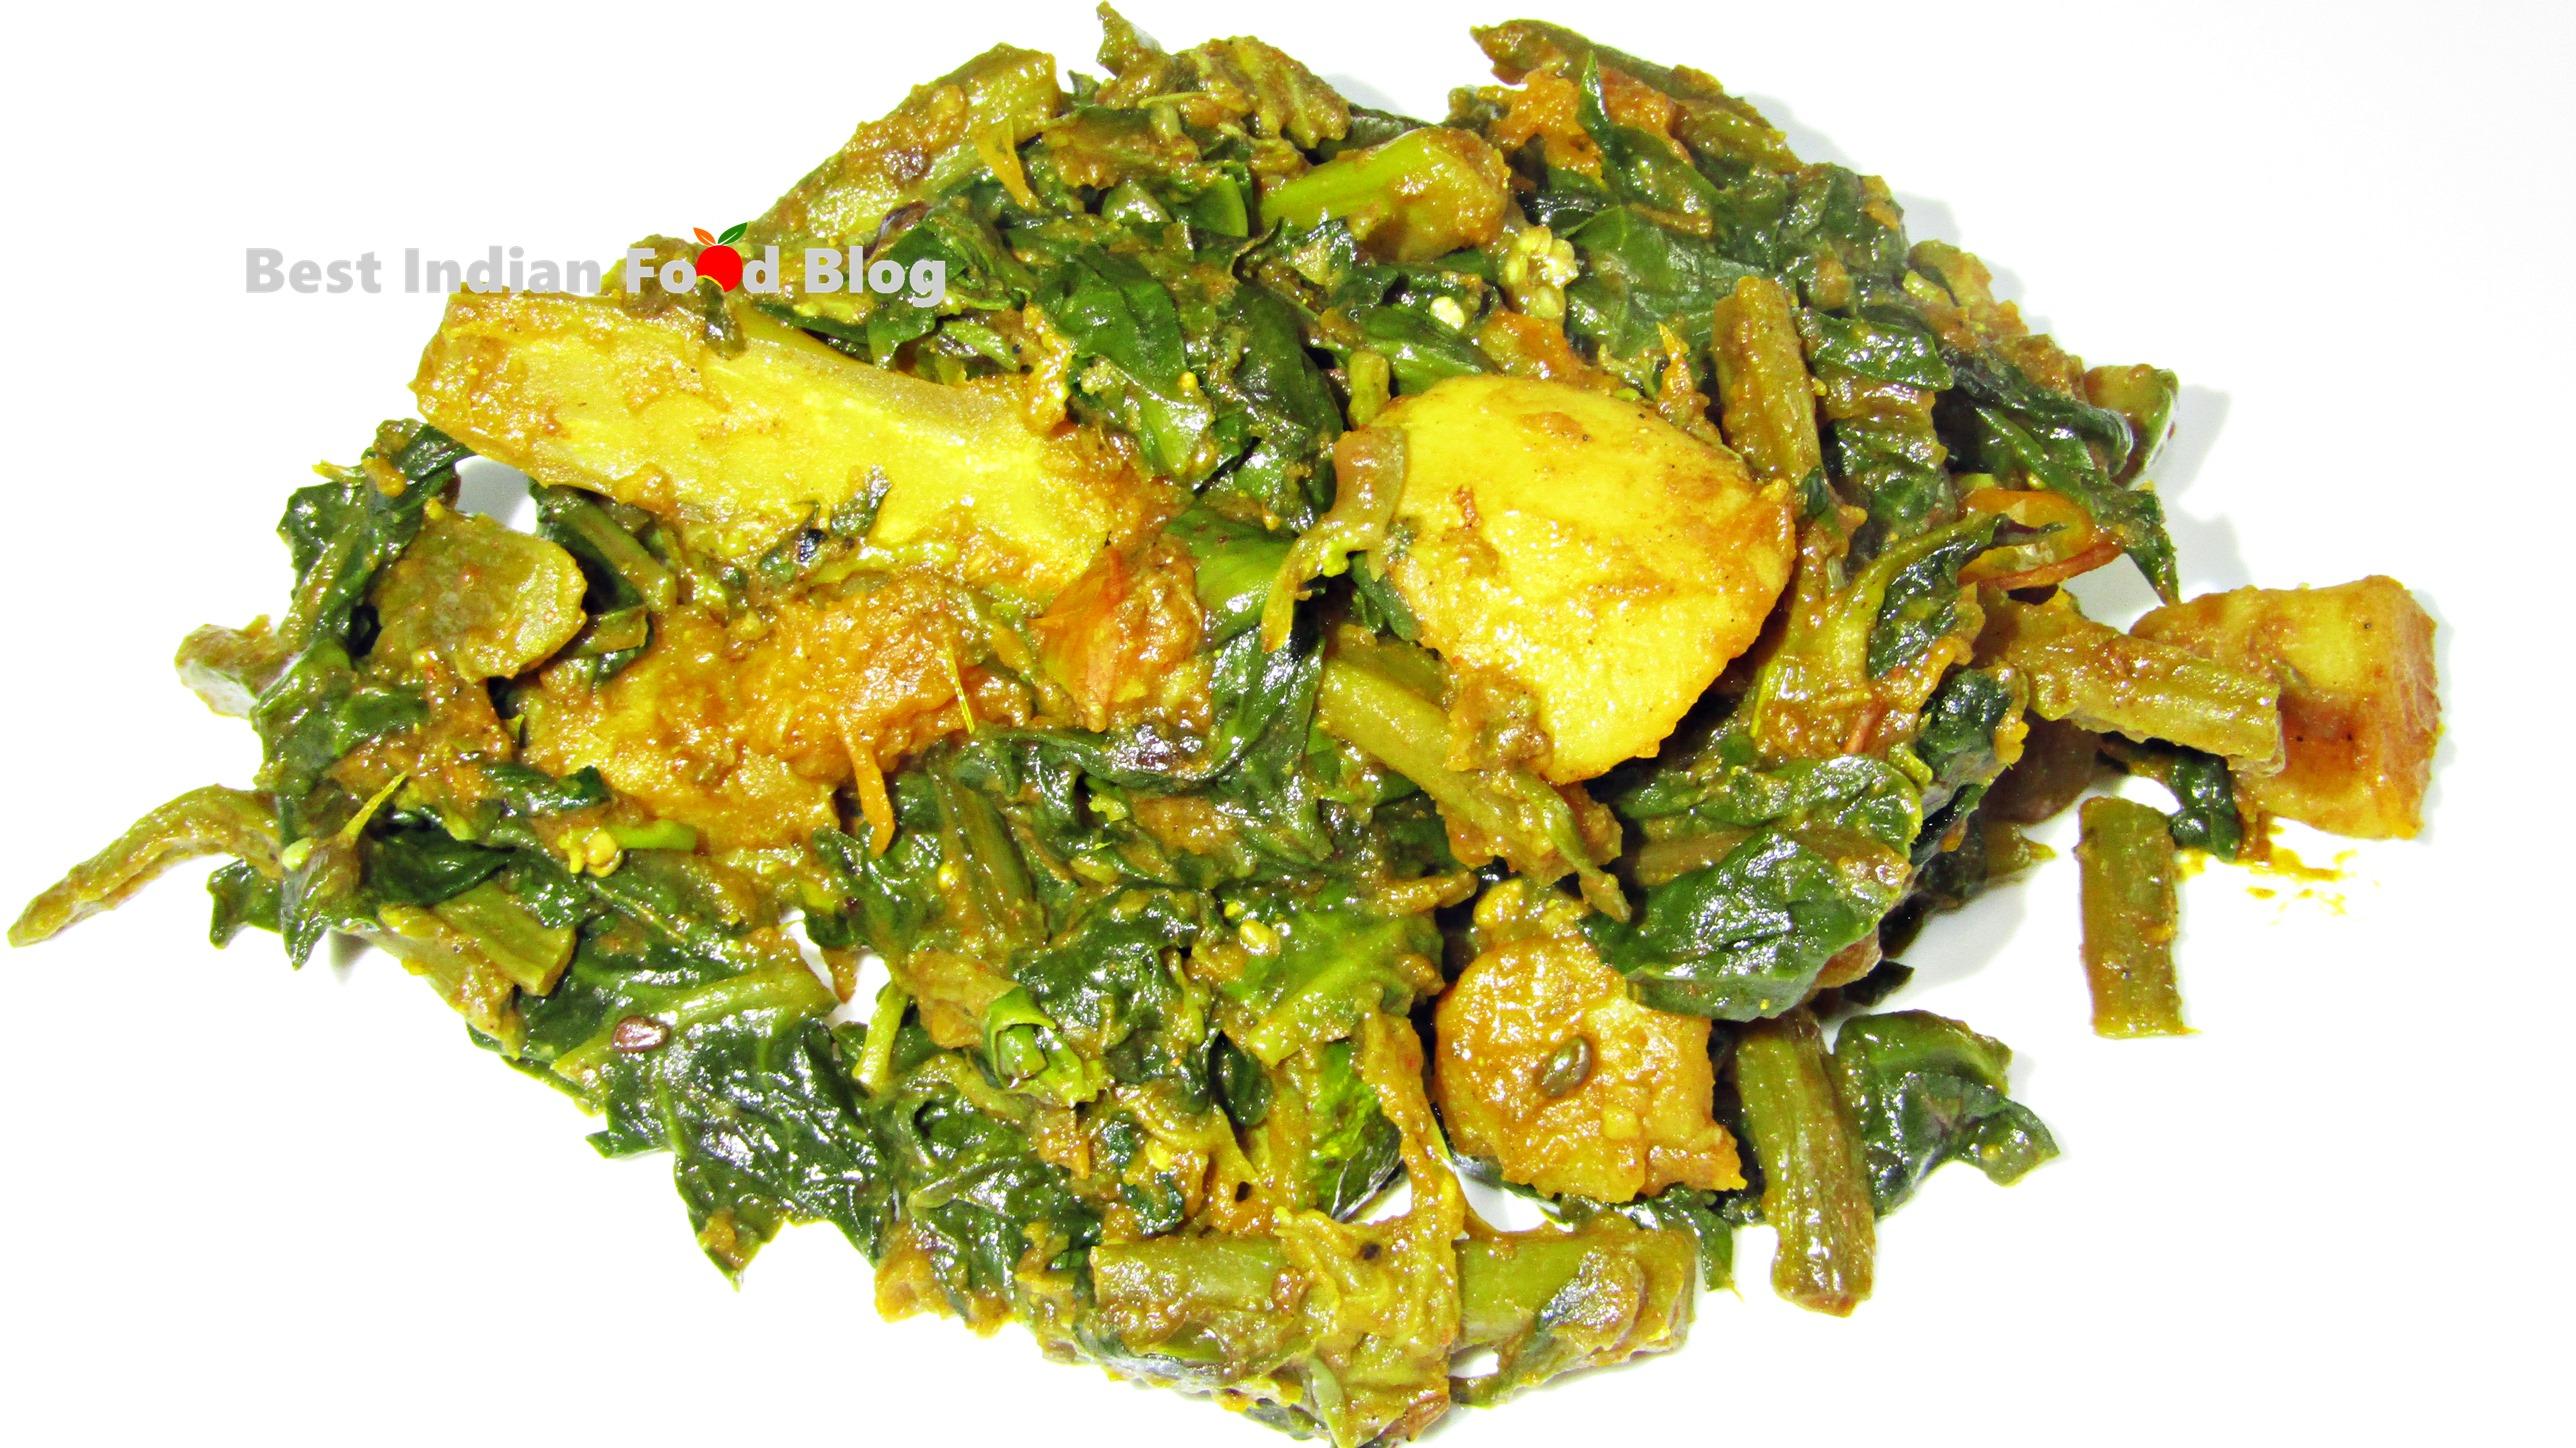 Poi Saga Tarkari from Odisha, India | Best Indian Food Blog